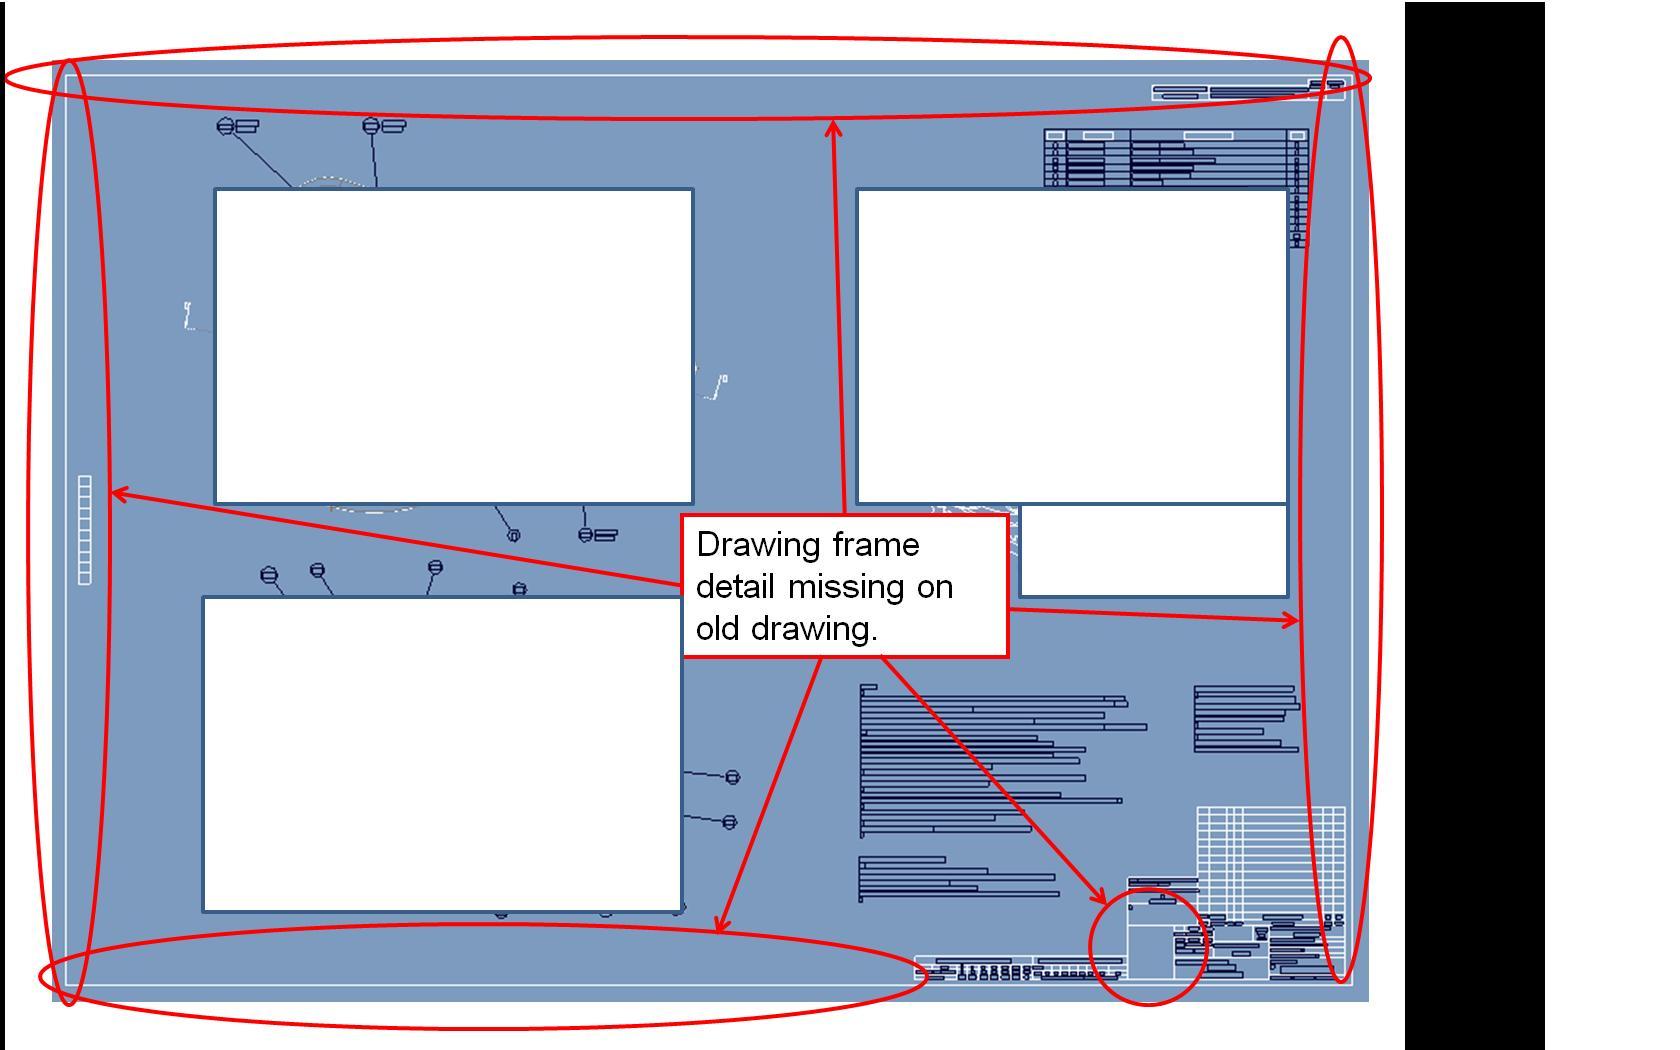 Missing drawing frame detail 1.JPG